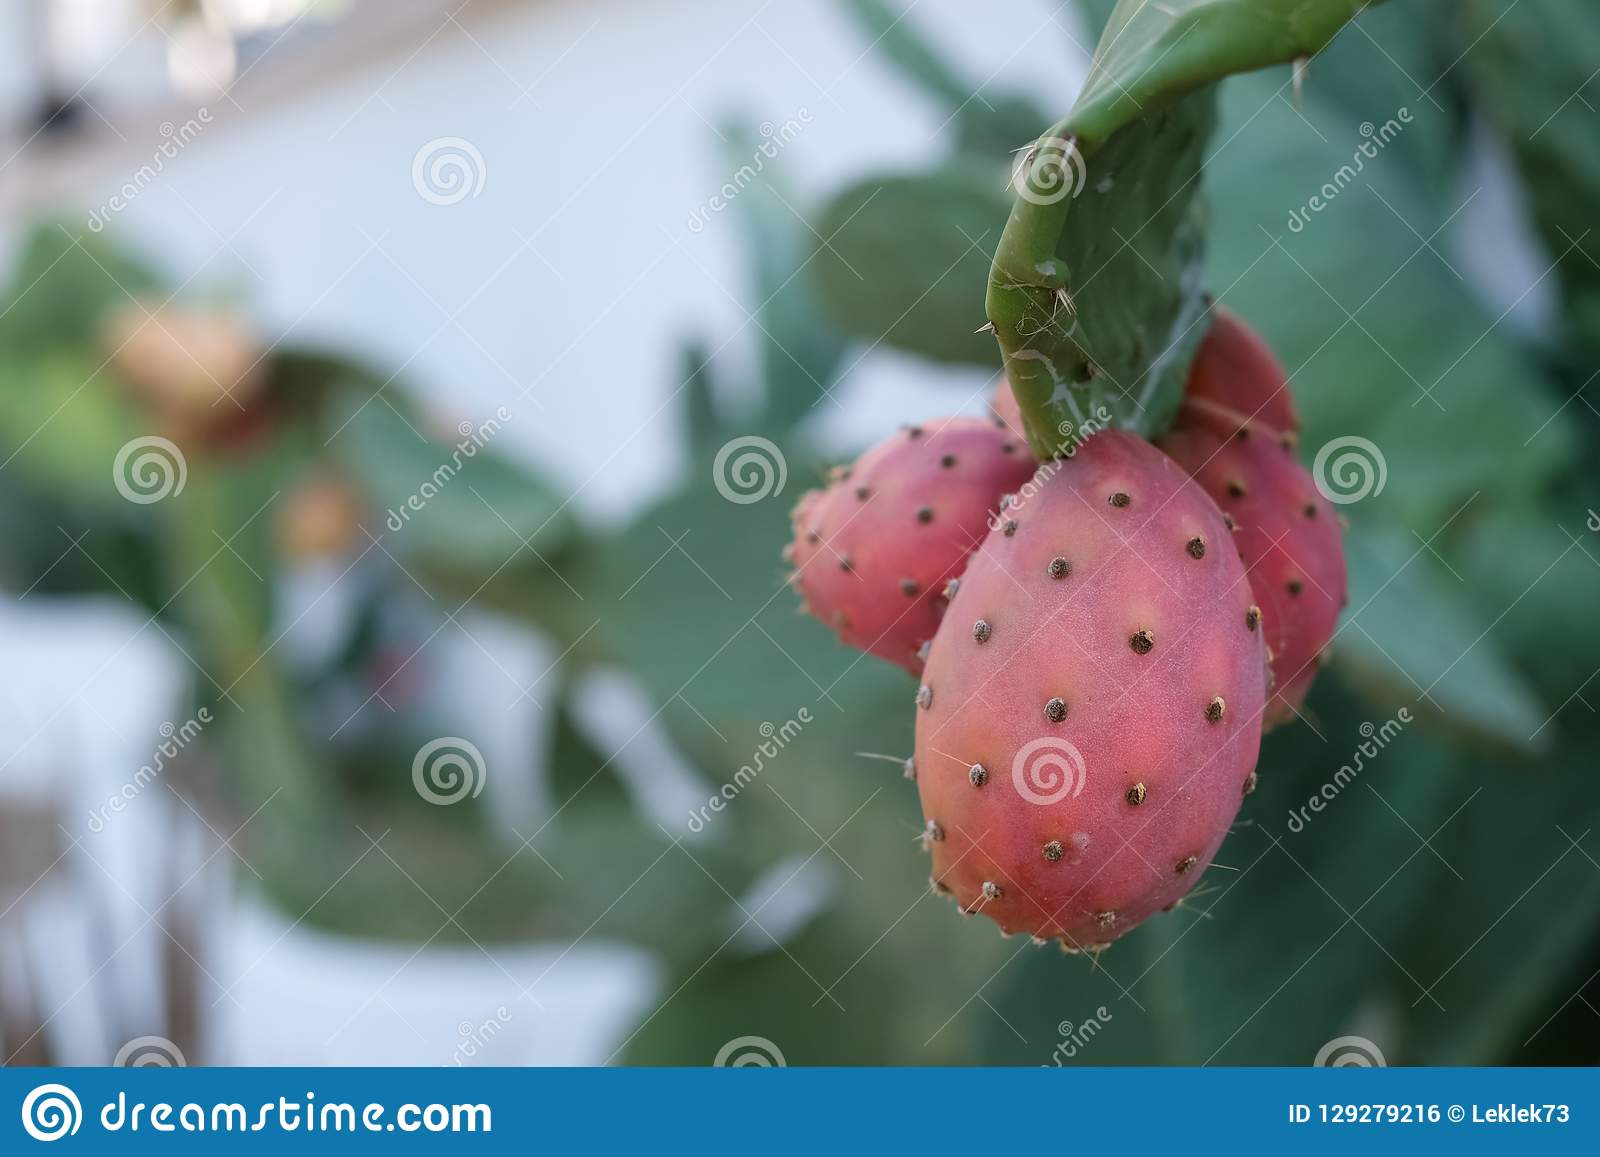 Crecimiento de fruta del cactus del higo chumbo cerca de Mattinata, Puglia, Italia